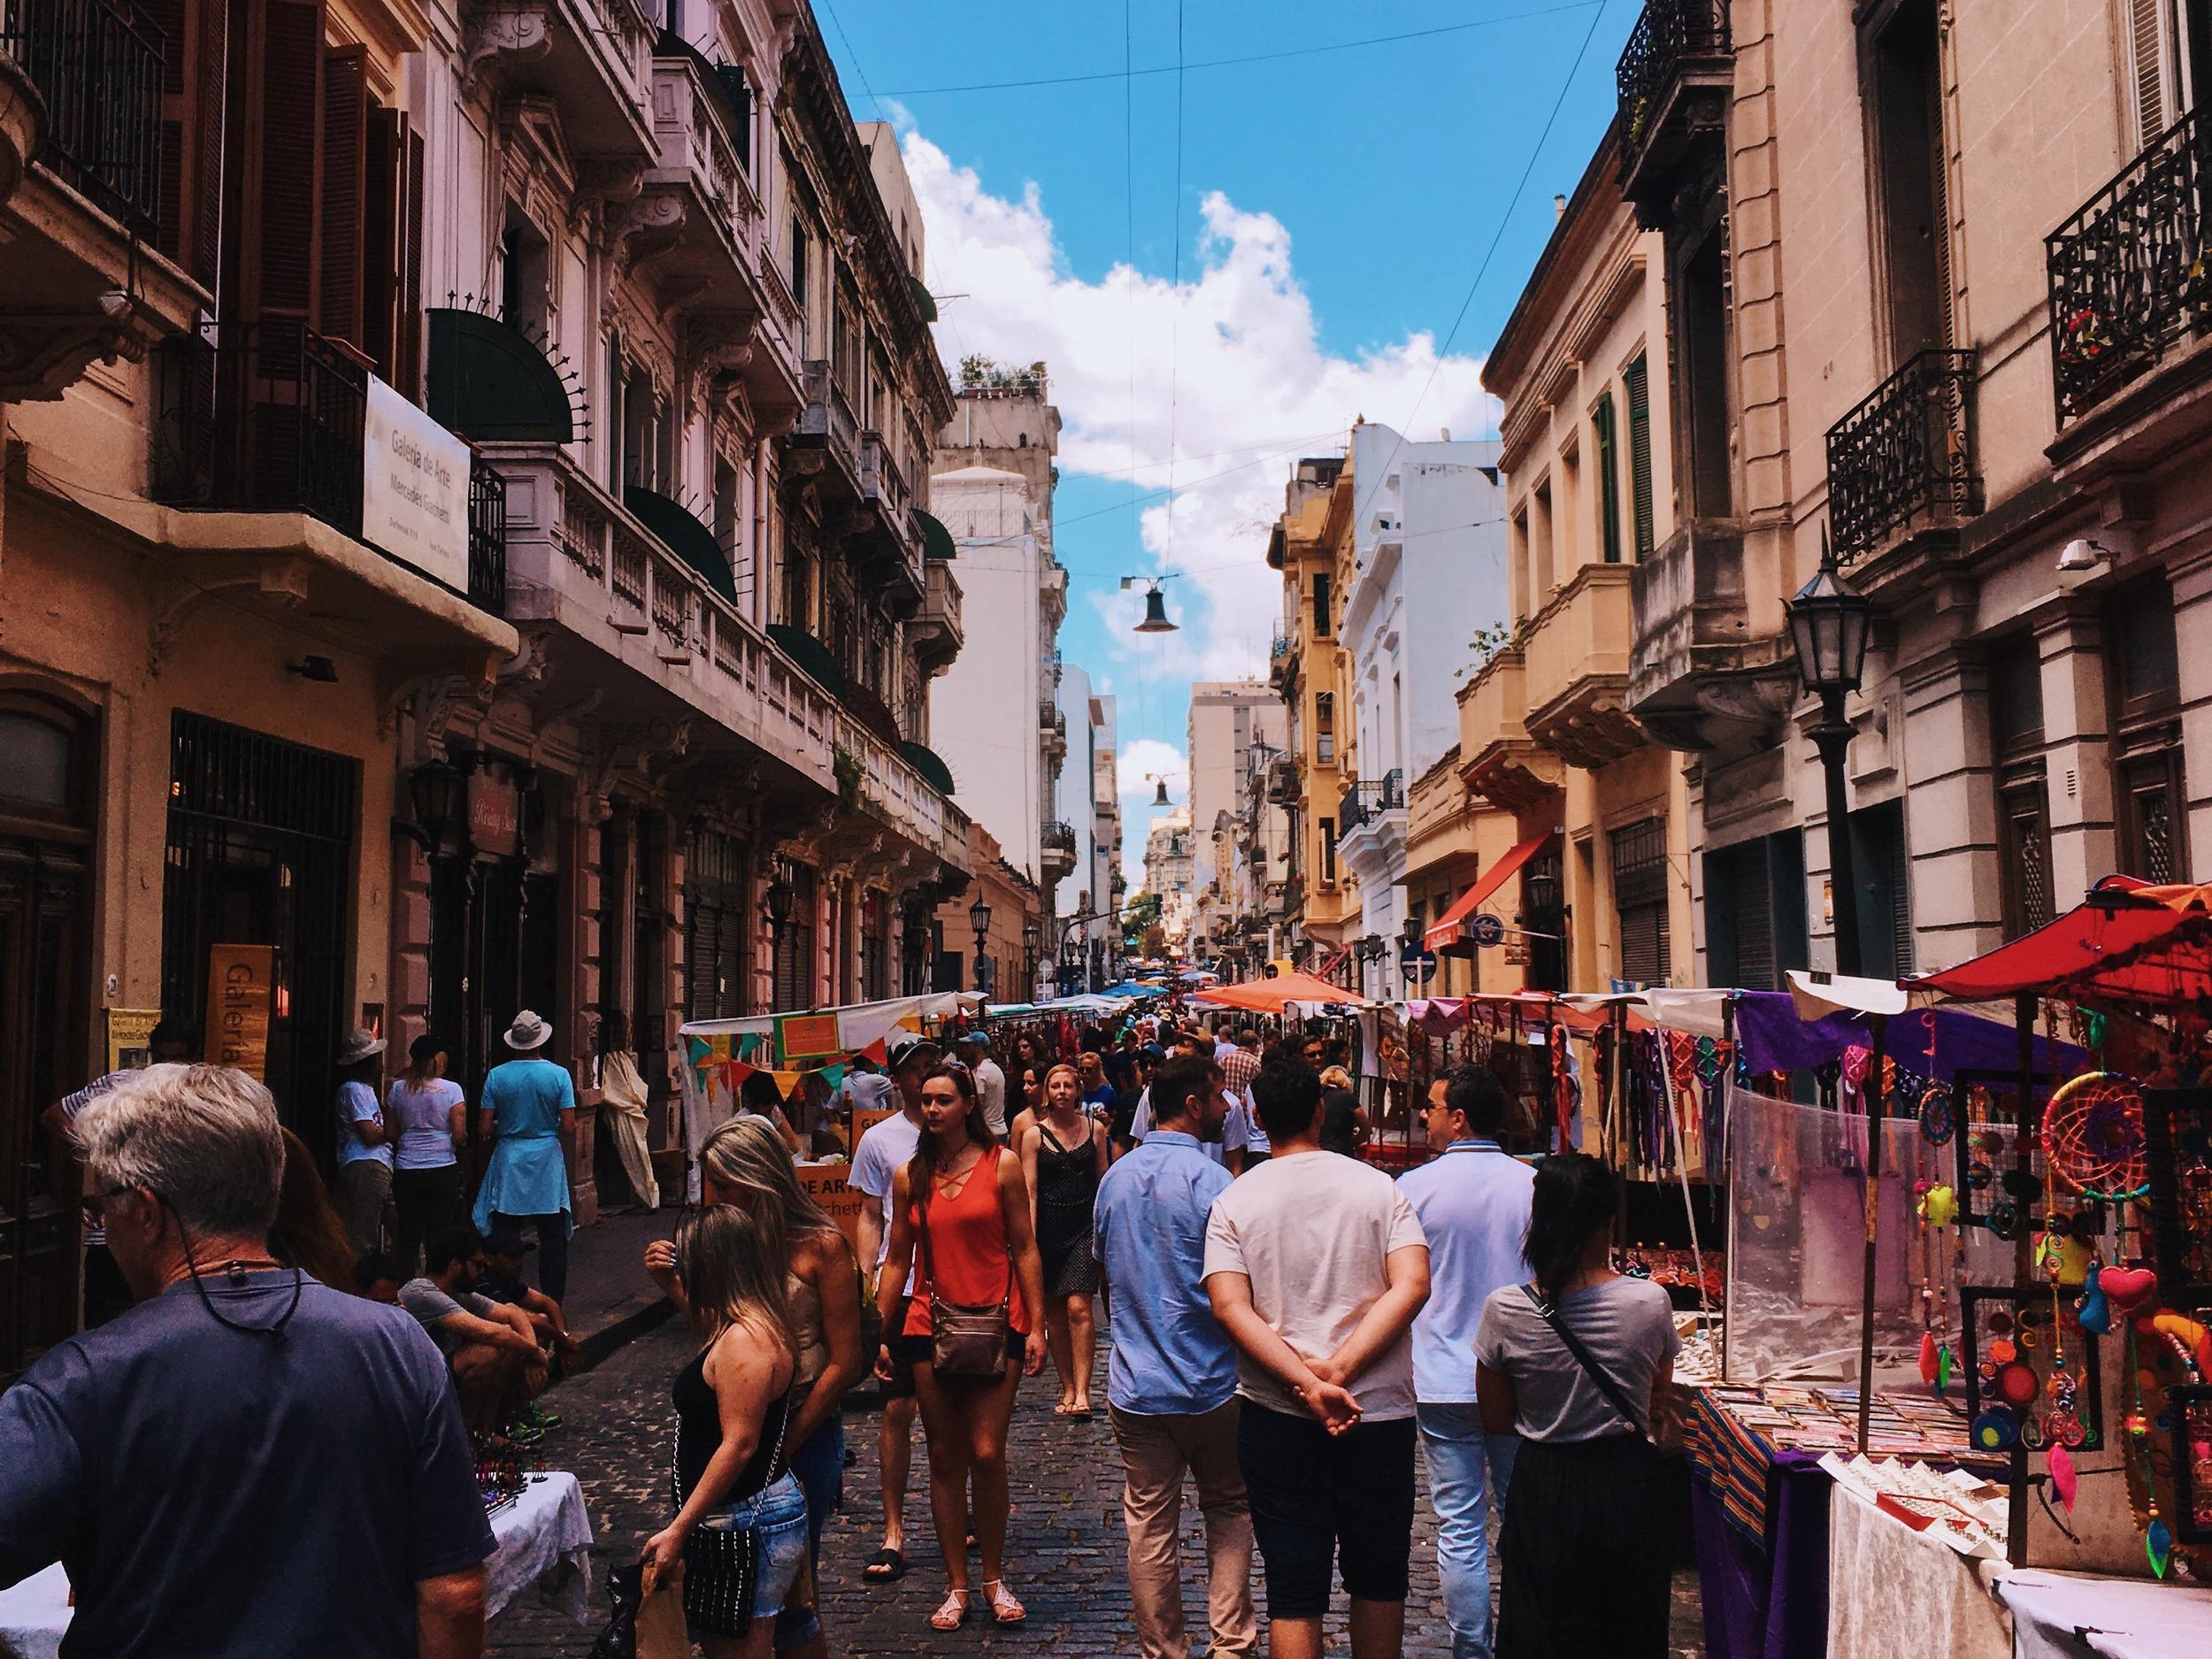 argentina-bazaar-buenos-aires-1060803.jpg